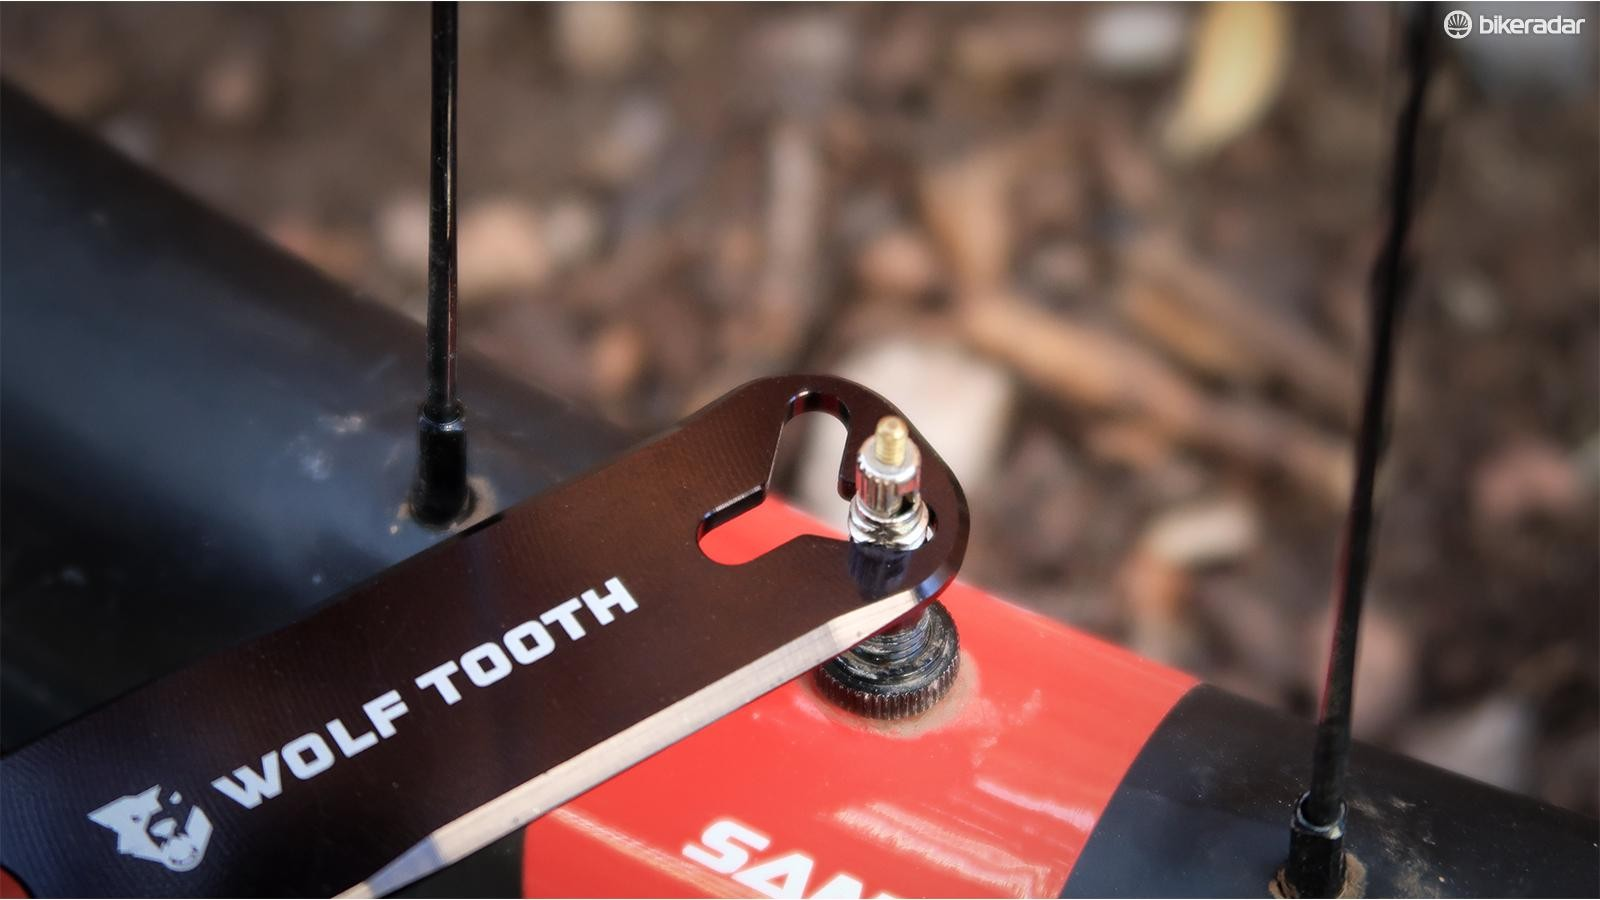 Have a loose valve core? Not a problem